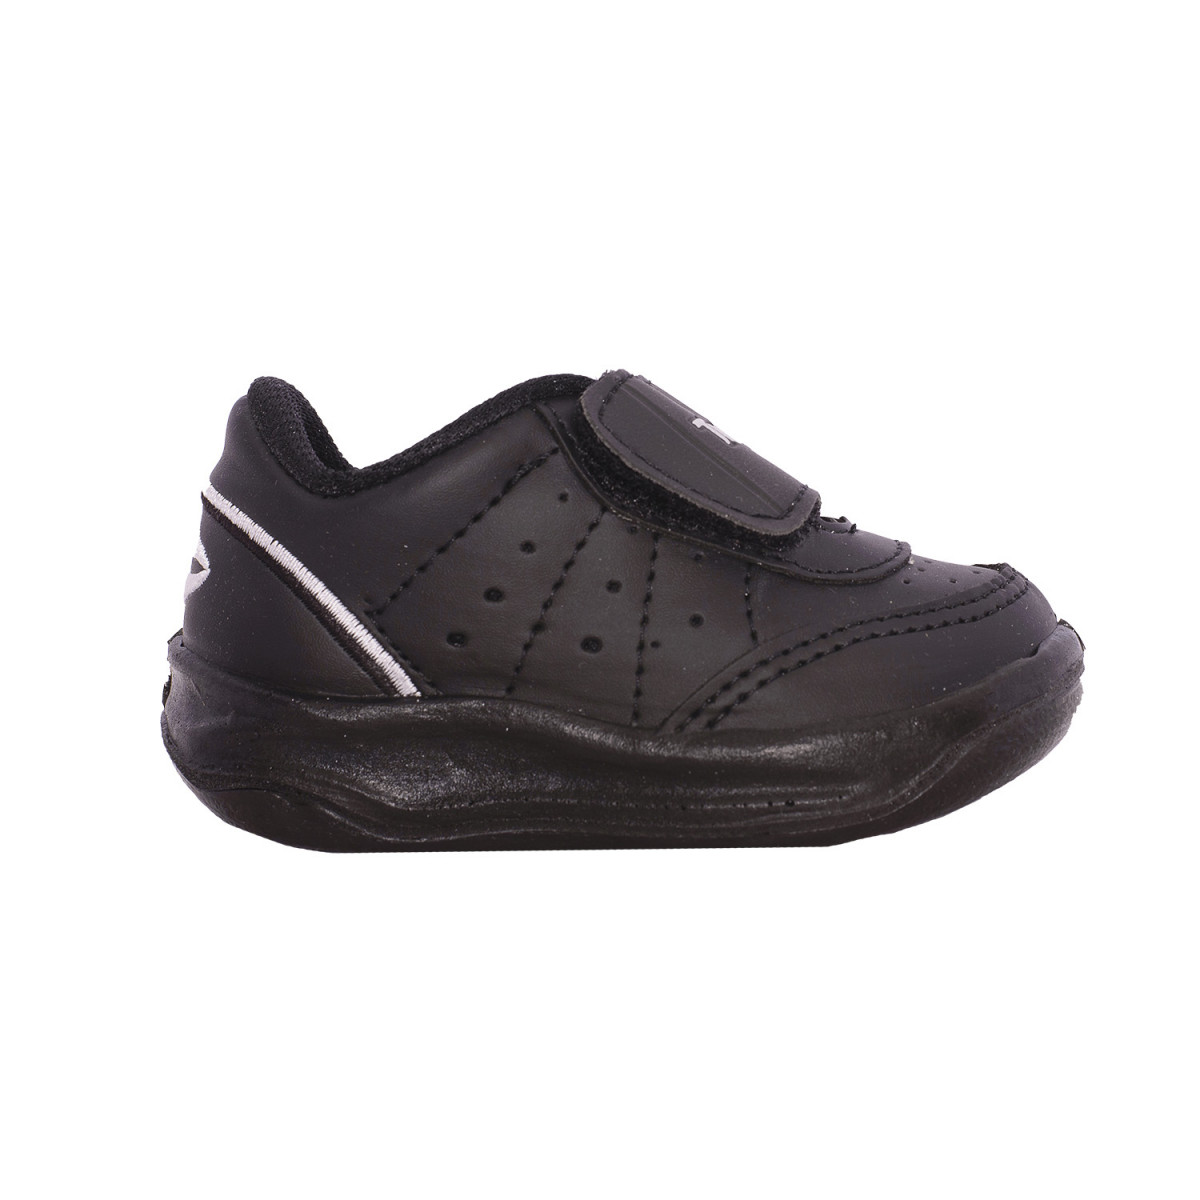 Zapatillas Topper Baby X Forcer Abrojo